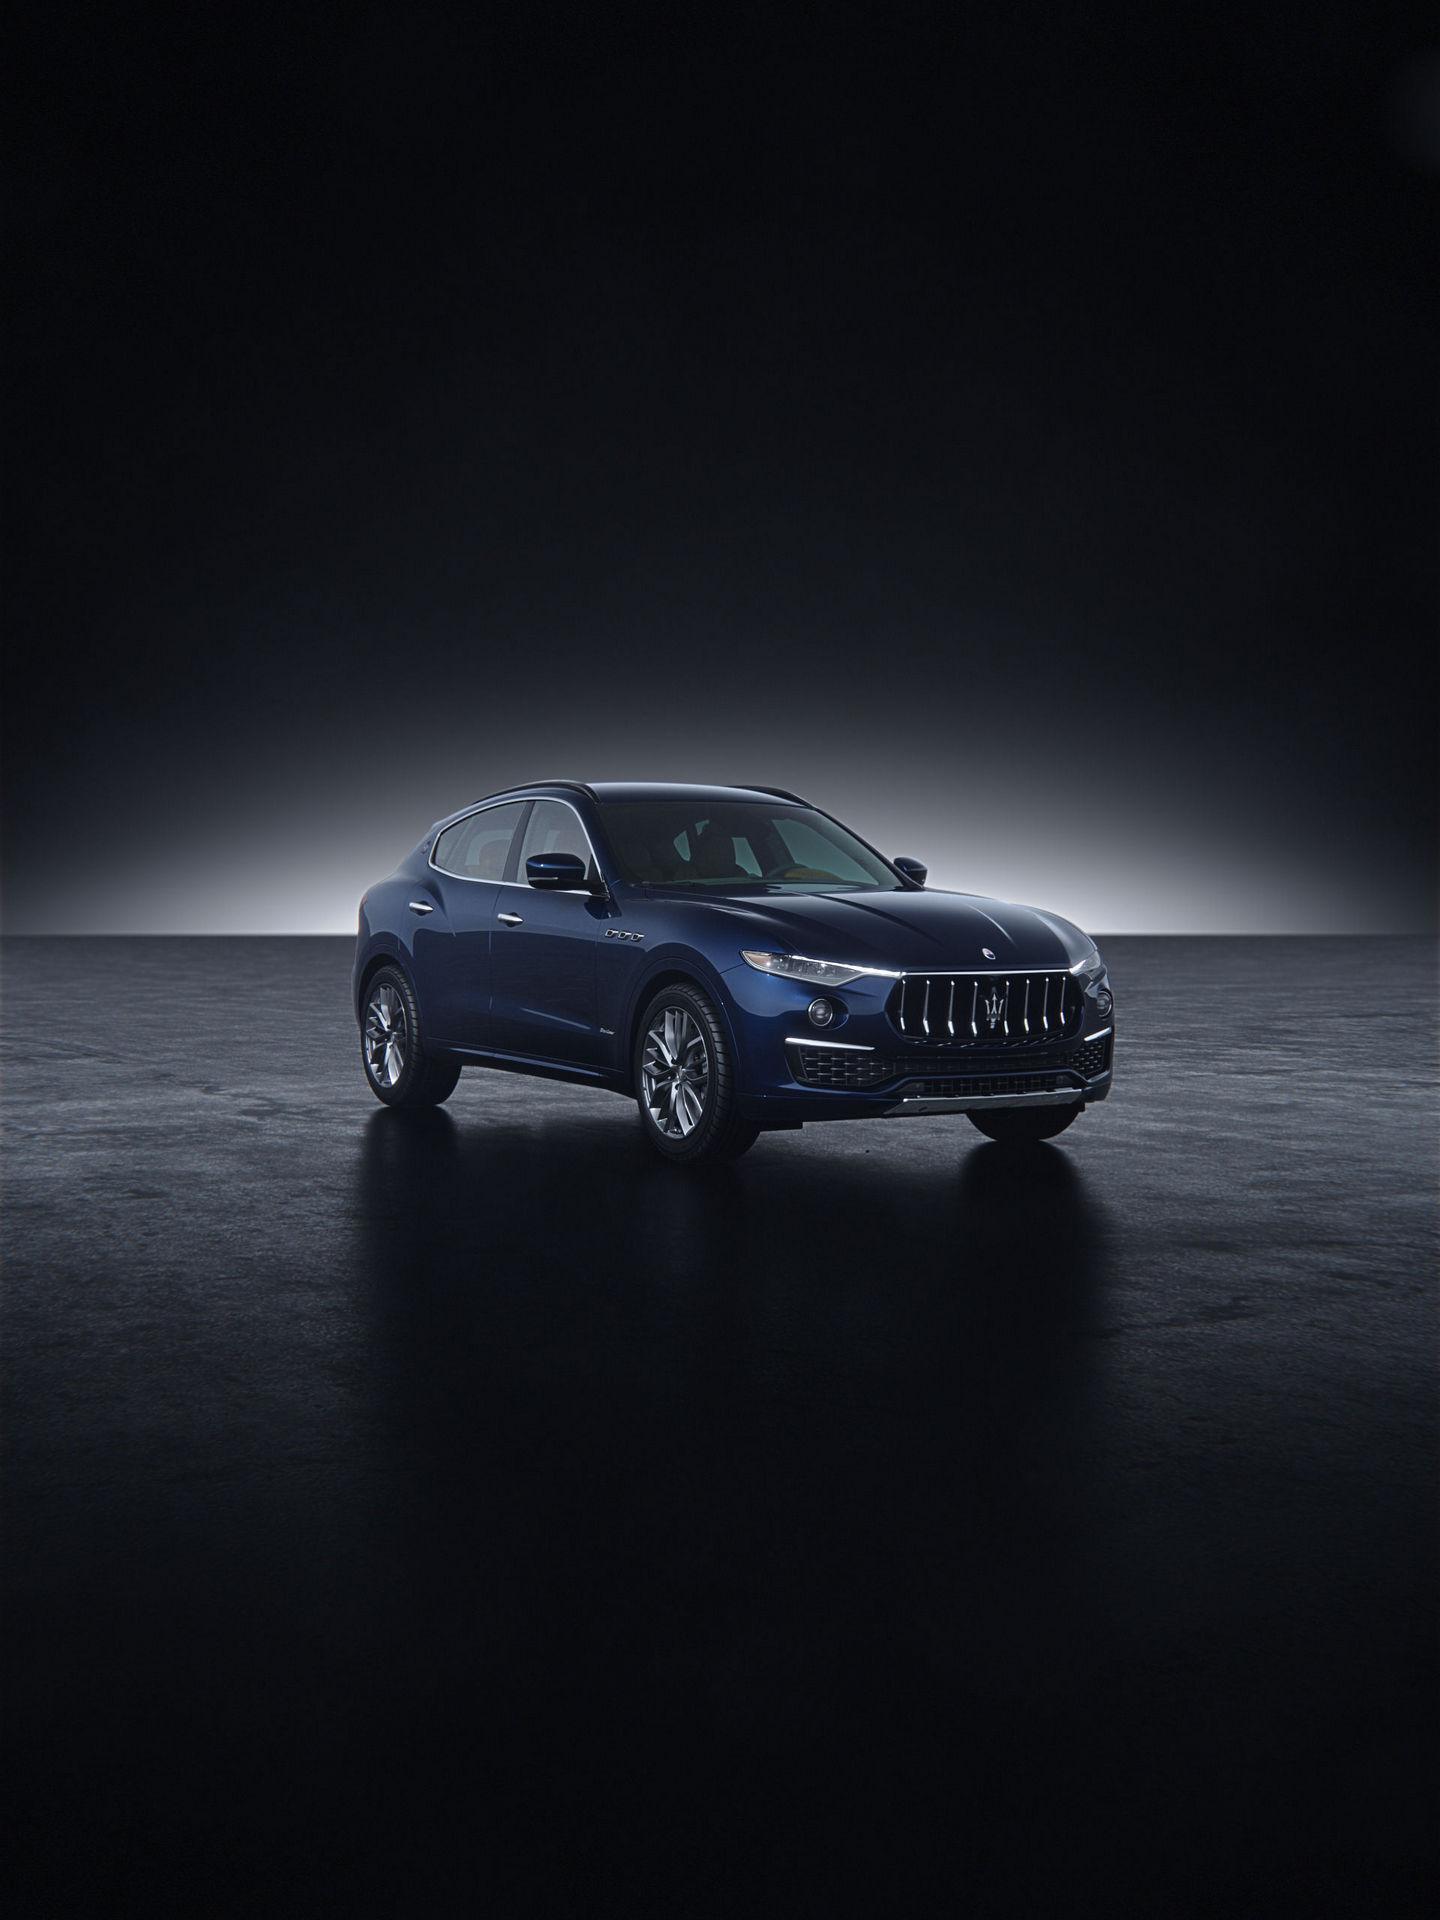 Maserati Levante - The Maserati of SUVs | Maserati UK